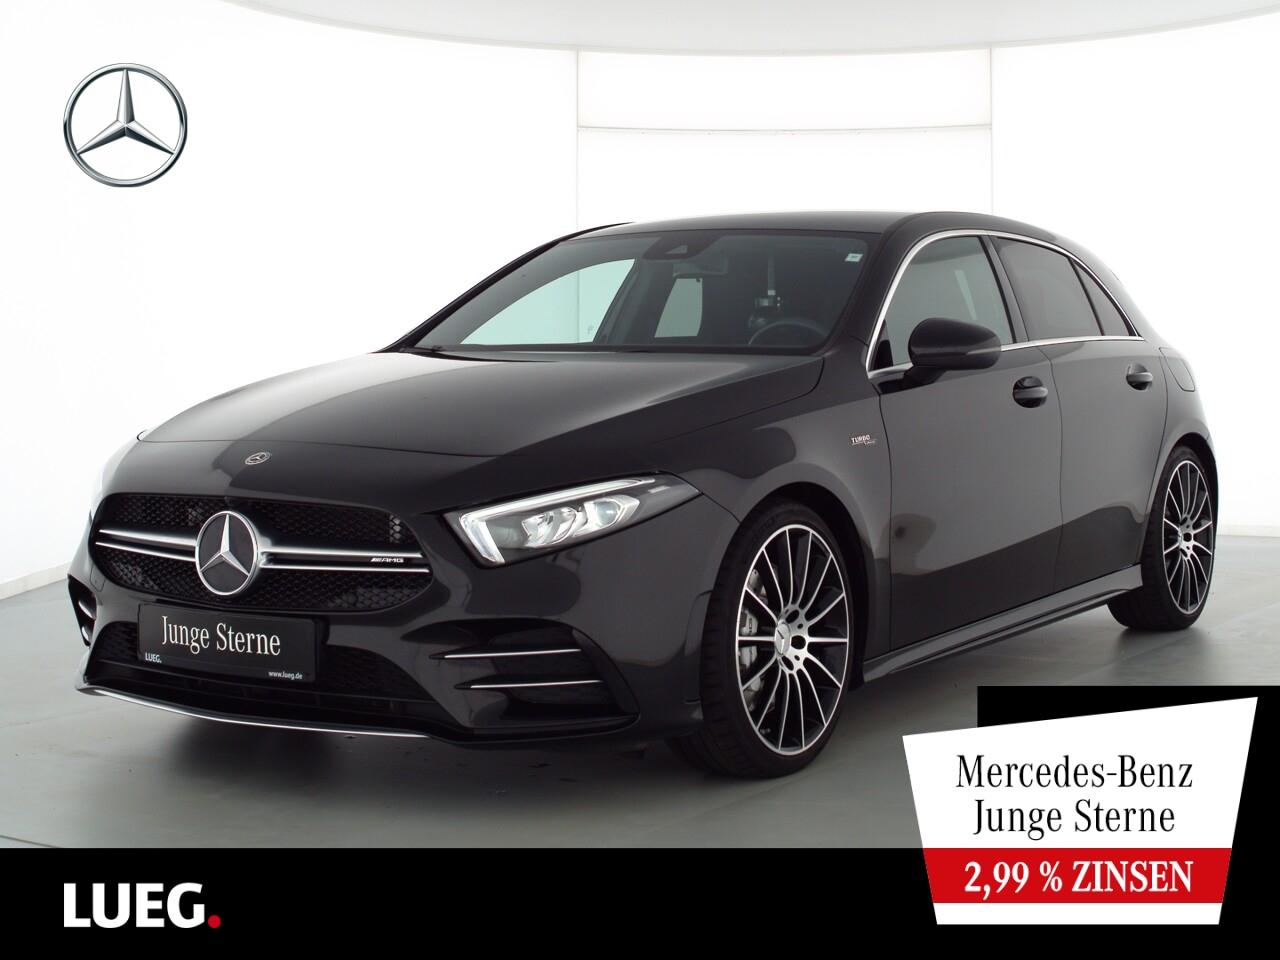 Mercedes-Benz A 35 AMG 4M MBUX+NavPrem+LED-HP+19''AMG+SHZ+Spur, Jahr 2019, Benzin